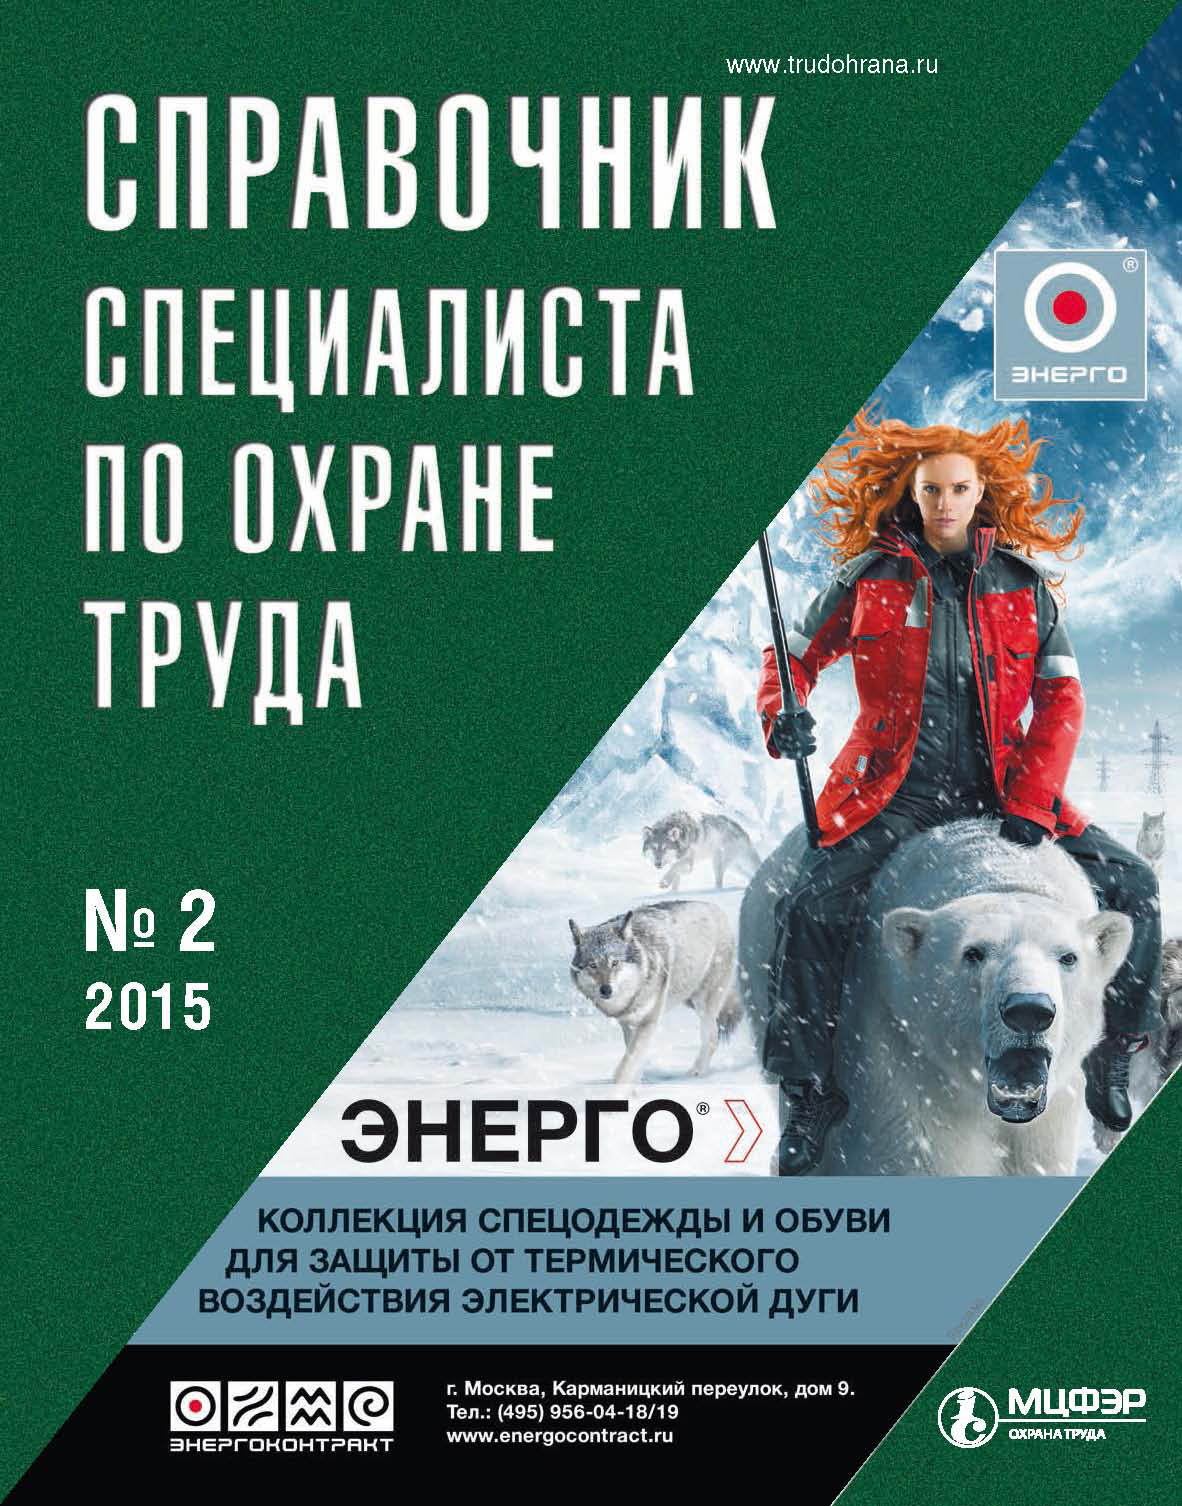 Справочник специалиста по охране труда № 2 2015